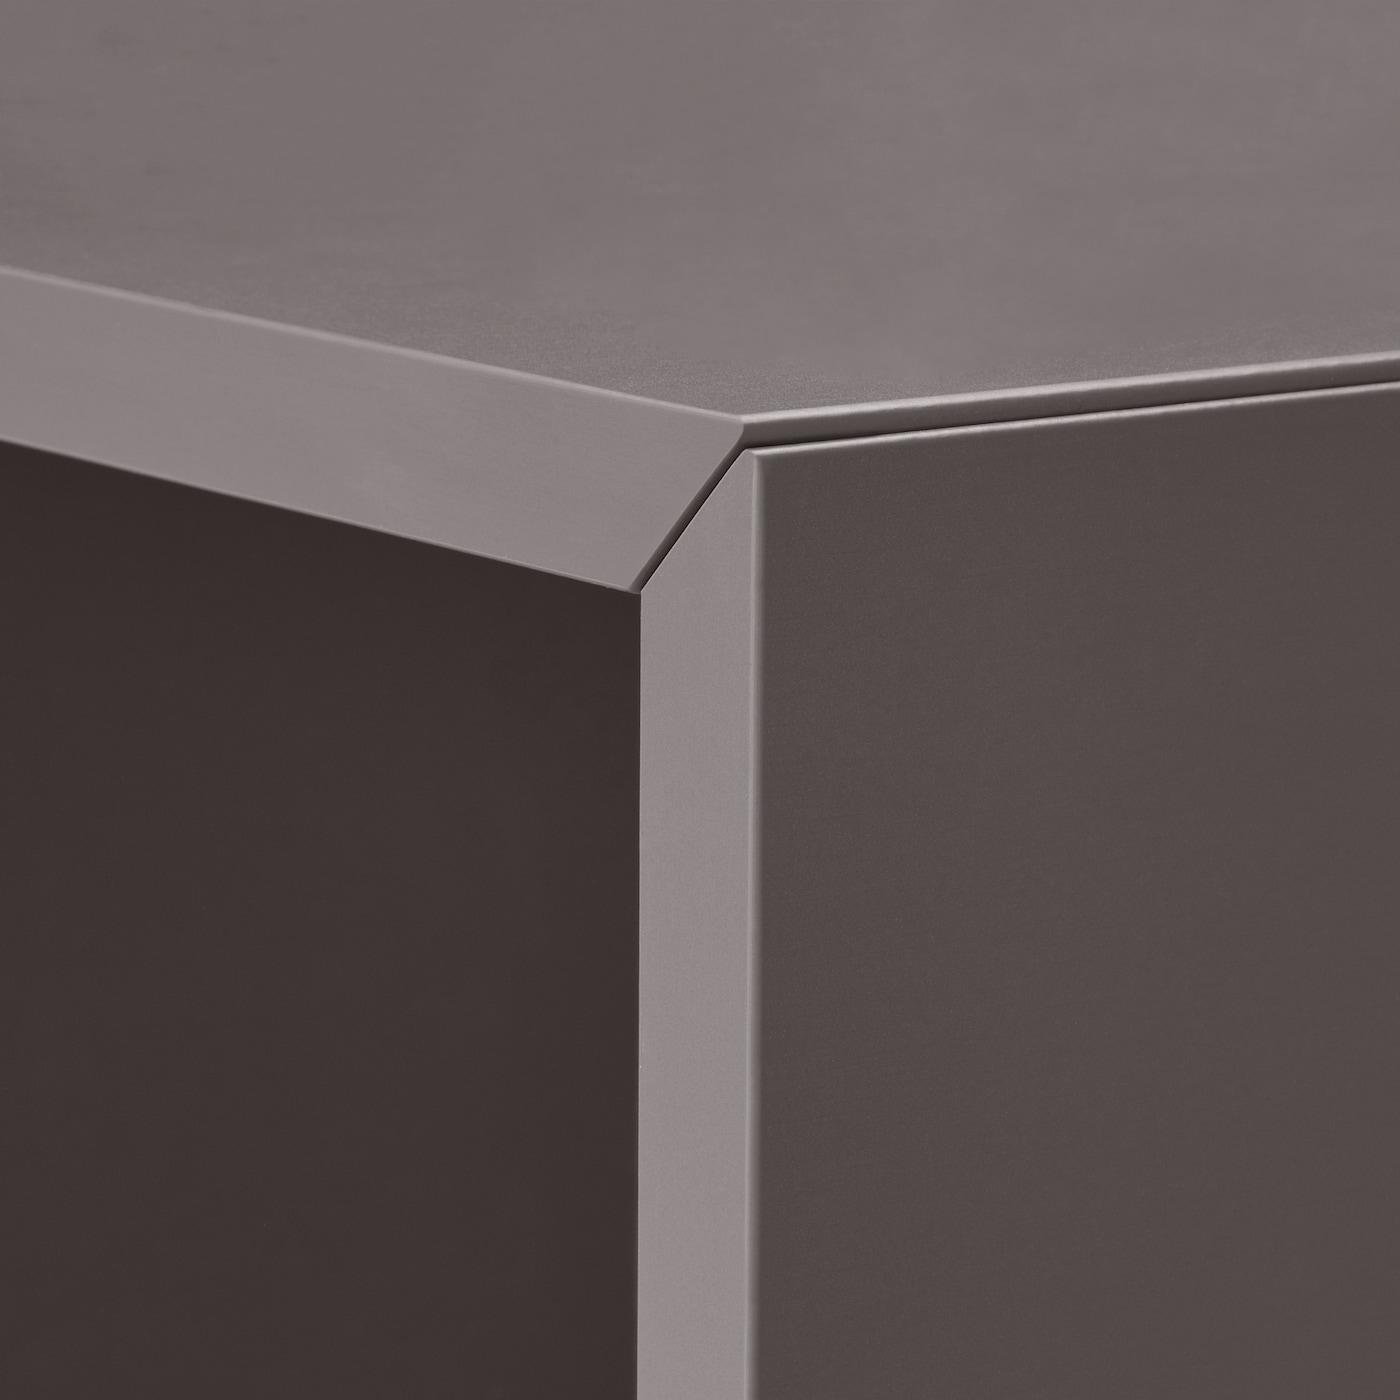 EKET 에케트 벽수납콤비네이션, 다크그레이, 175x35x210 cm